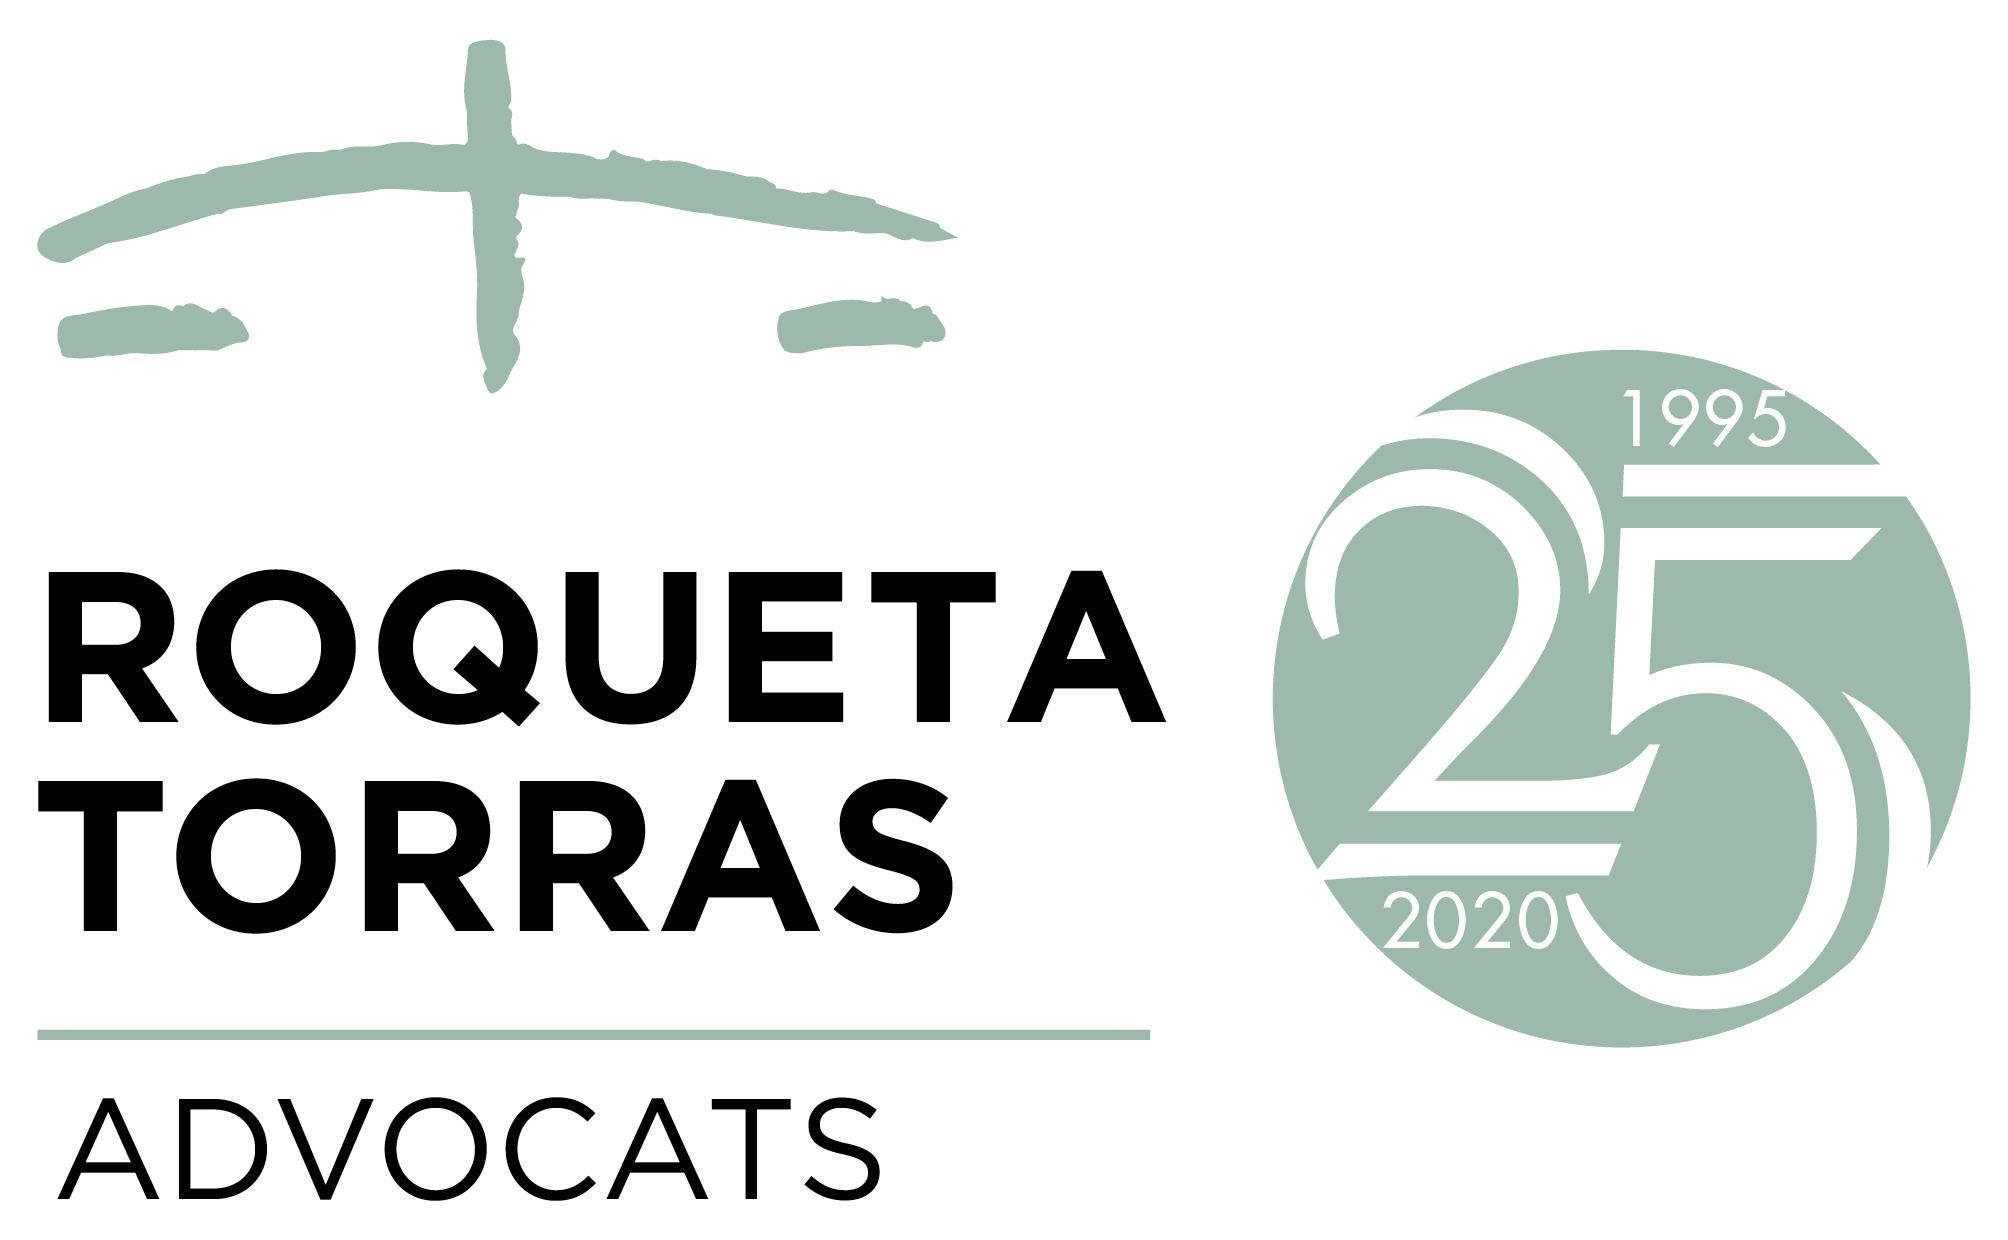 Roqueta Torras